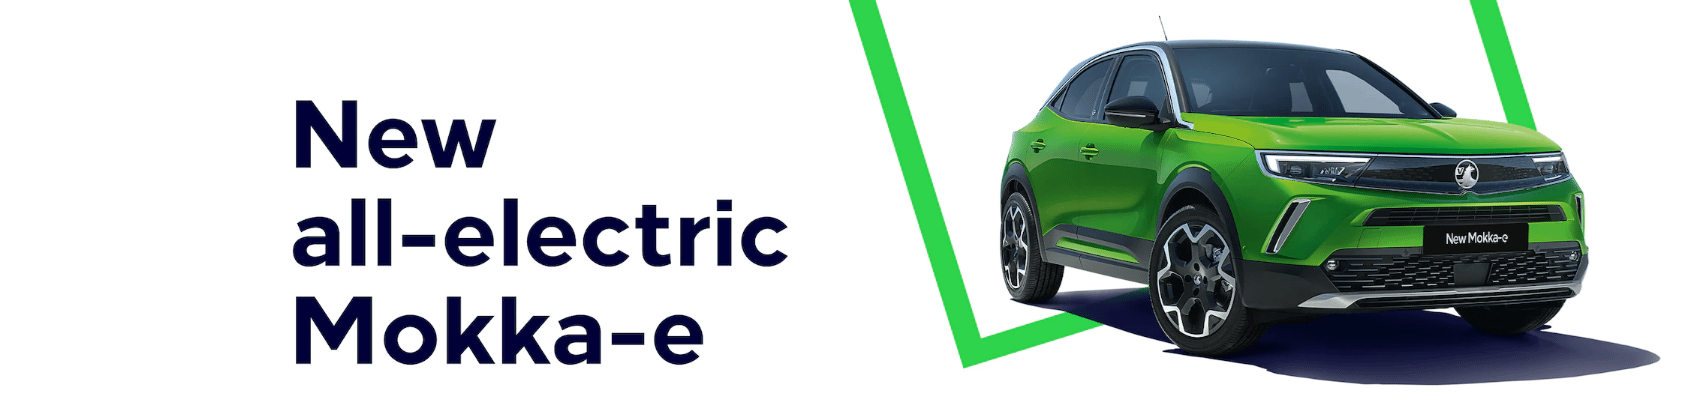 New All-Electric Mokka-E